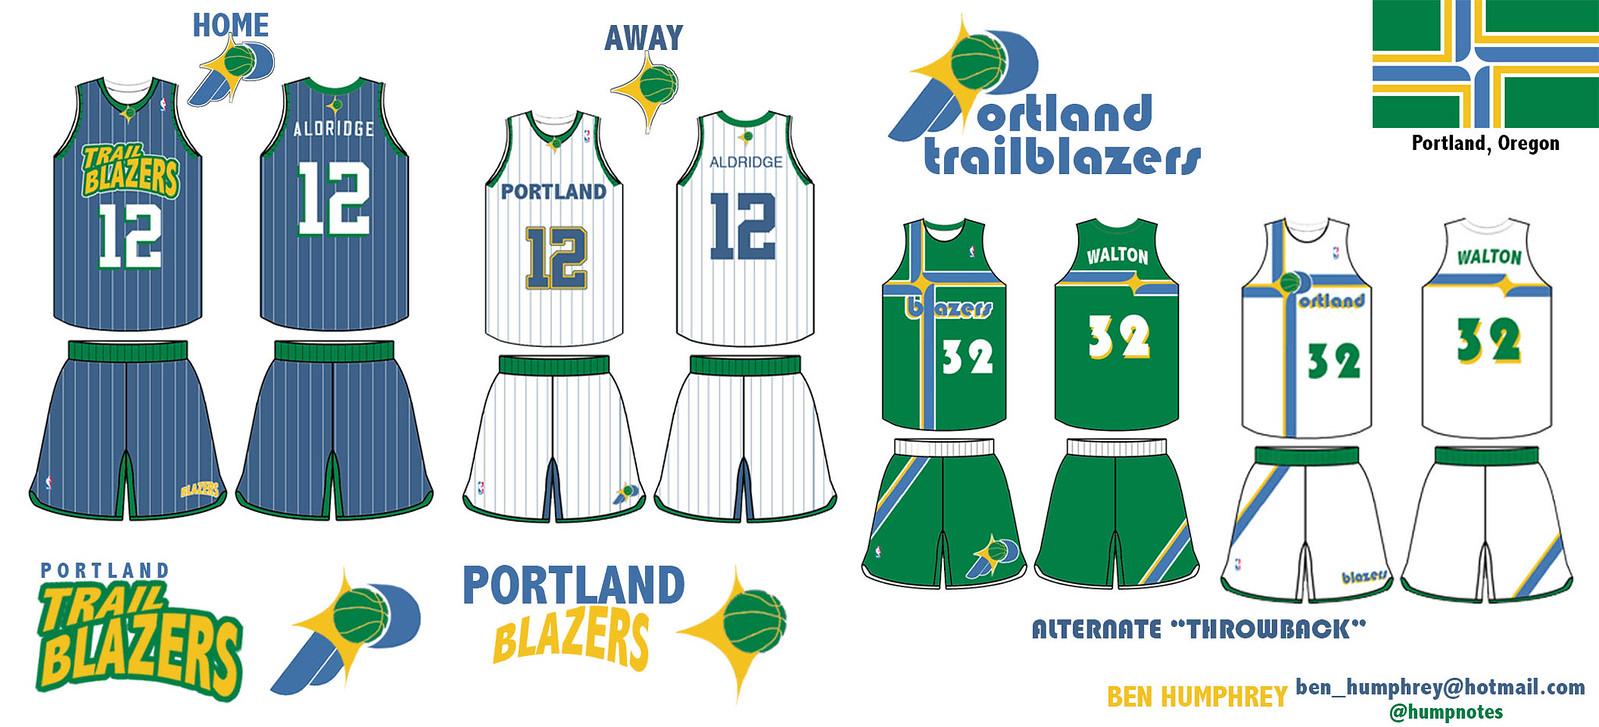 new concept 3dbe7 23f59 green portland trail blazers jersey